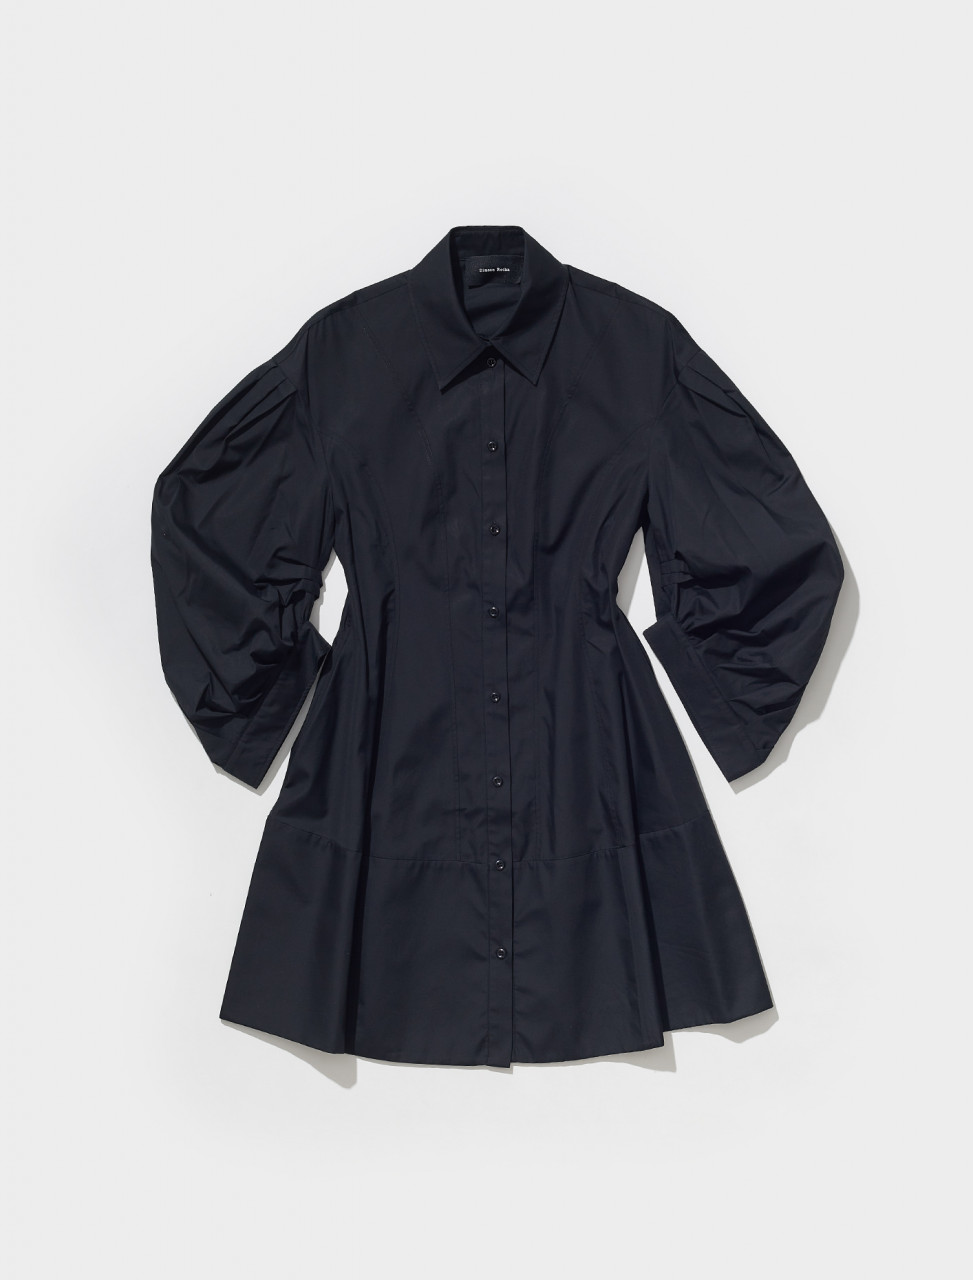 5066_0109 SIMONE ROCHA SIGNATURE SLEEVE SCULPTED SHIRT DRESS IN BLACK